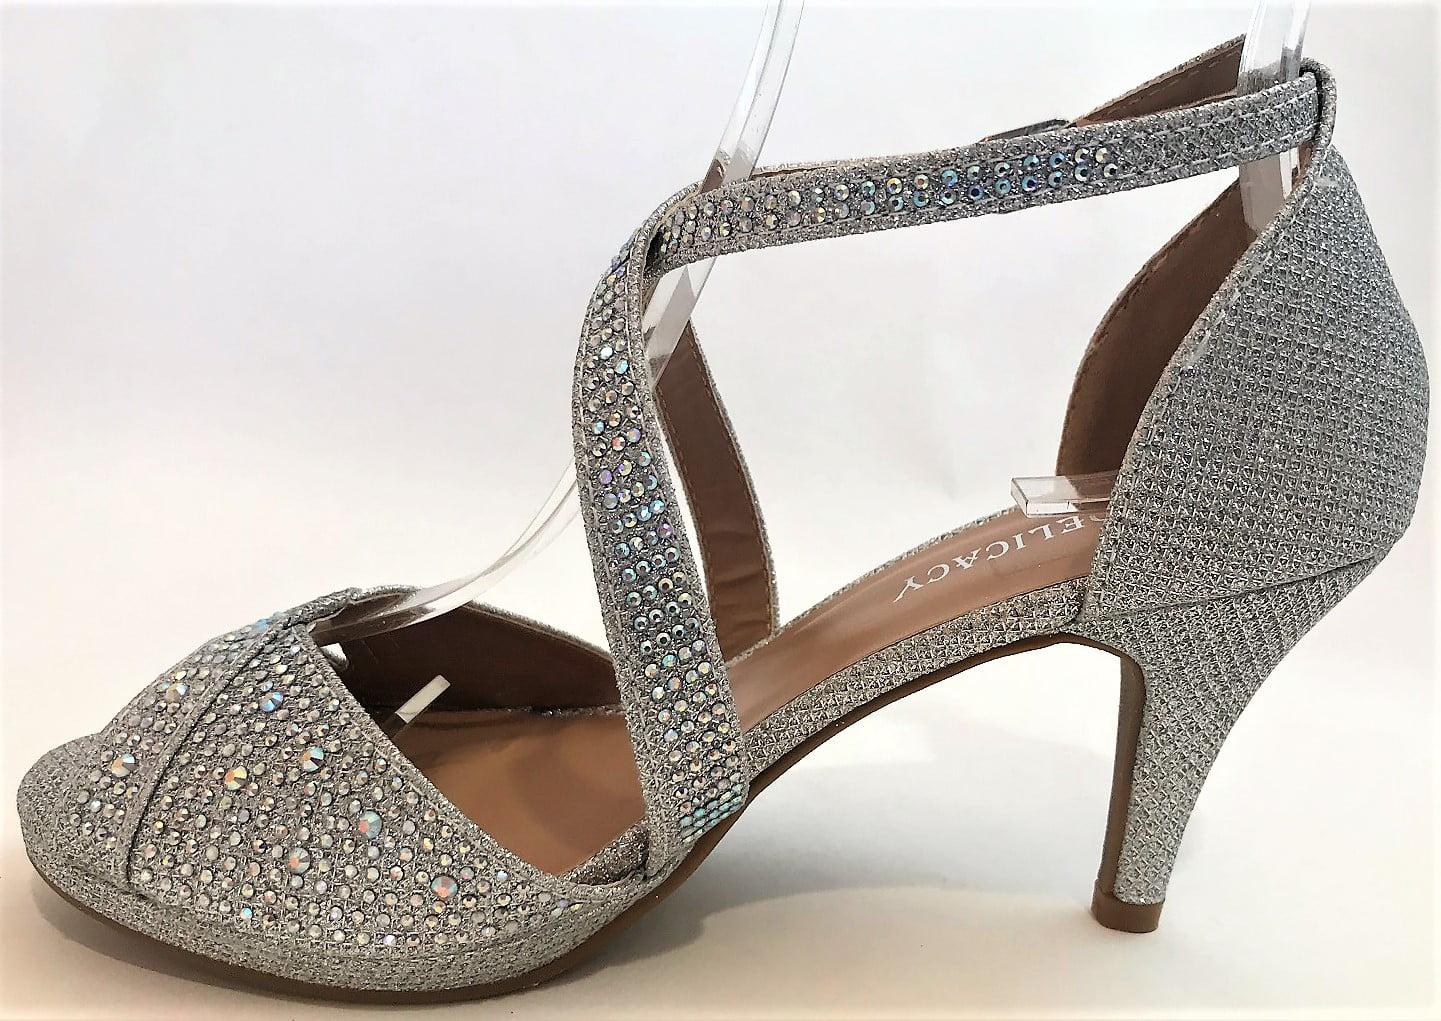 d007ef0cd0c Excited-90 Women Party Evening Dress Bridal Wedding Rhinestone Platform  Kitten Low Heel Sandal Shoes Silver